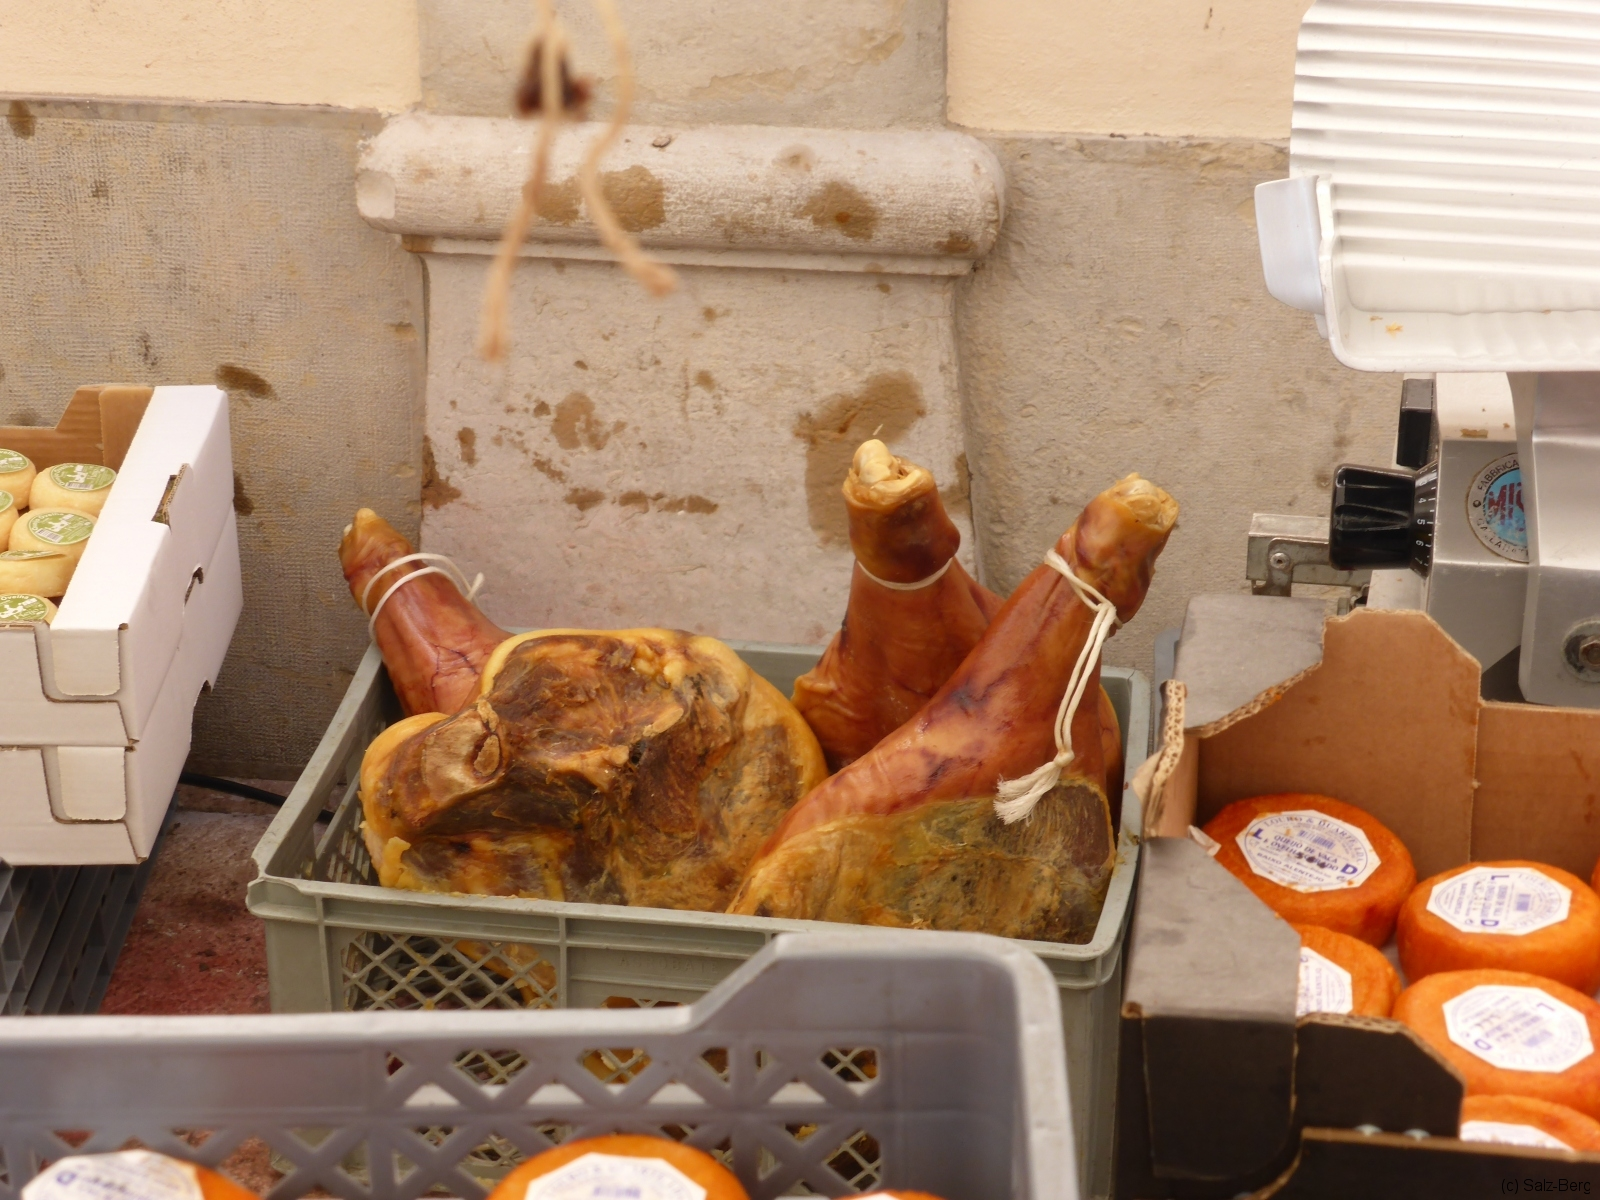 Algarve-567-P1050990